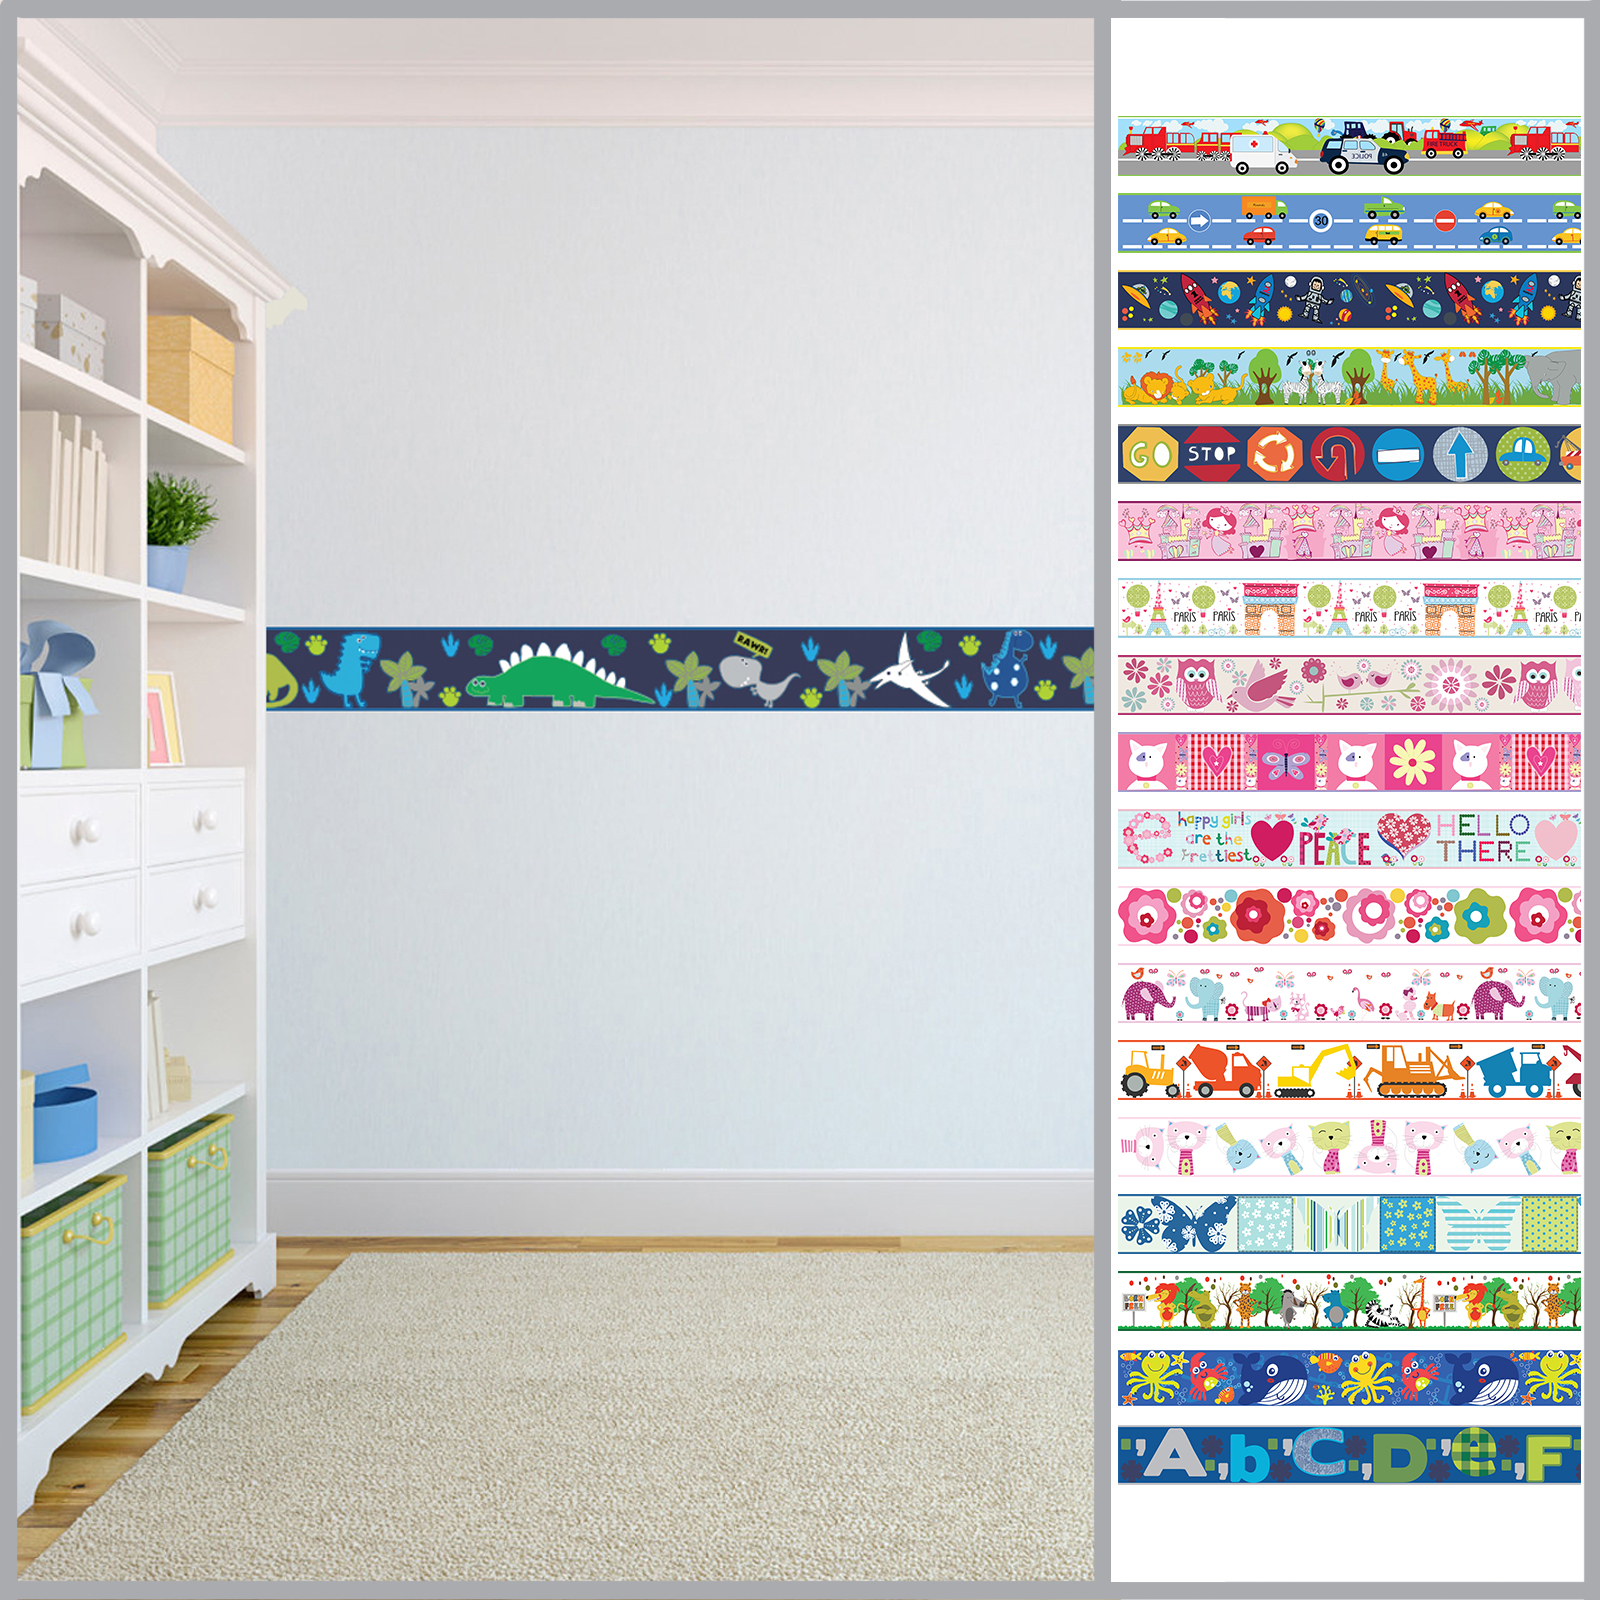 47+] Wallpaper Borders for Kids Bedrooms on WallpaperSafari